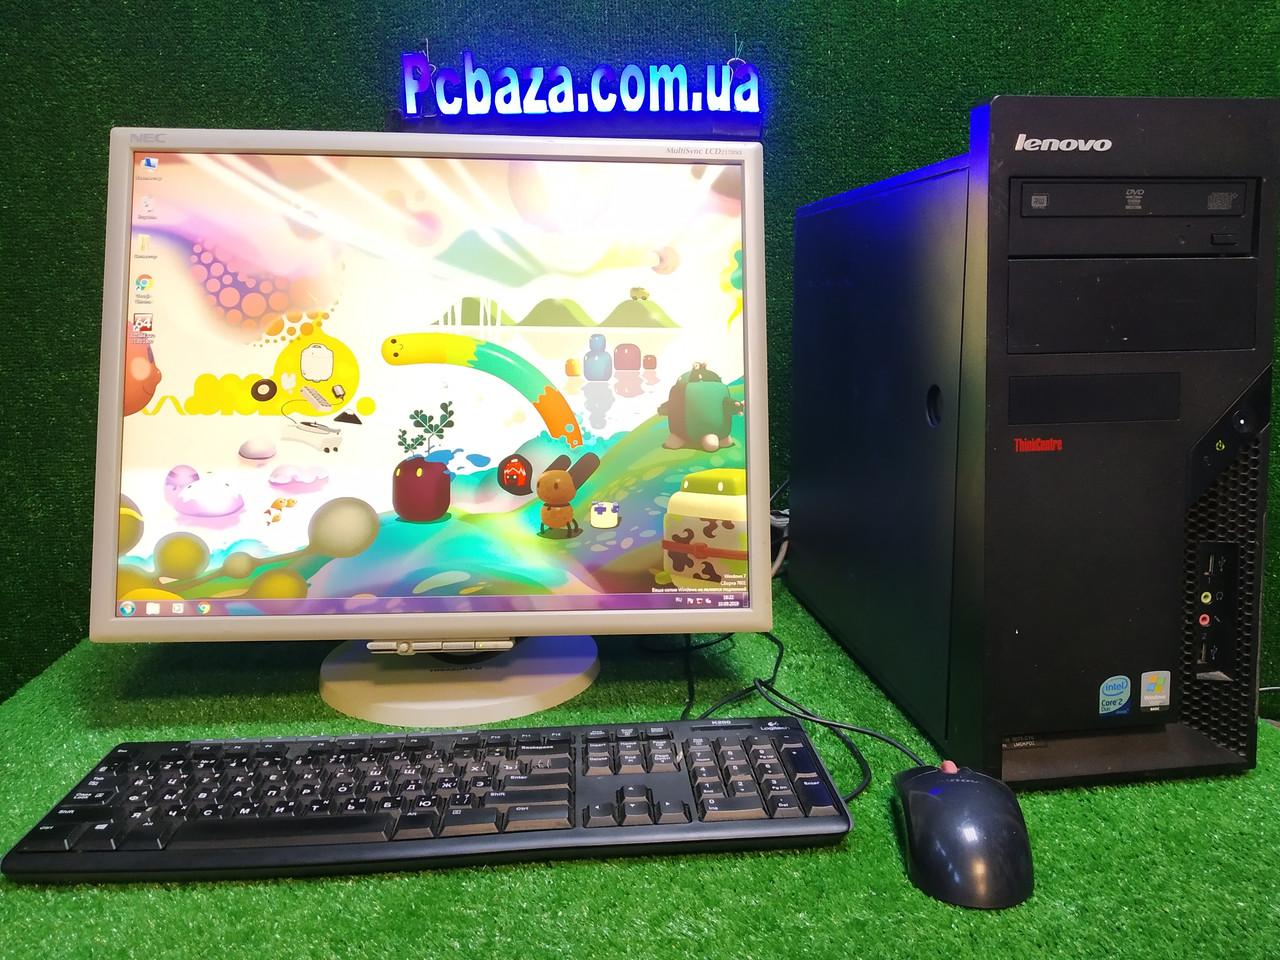 "Компьютер Lenovo \ Intel 4 ядра, 4 ГБ ОЗУ, 160 Гб+ PVA Монитор NEC 22"" ( клавиатура и мышка в подарок)"